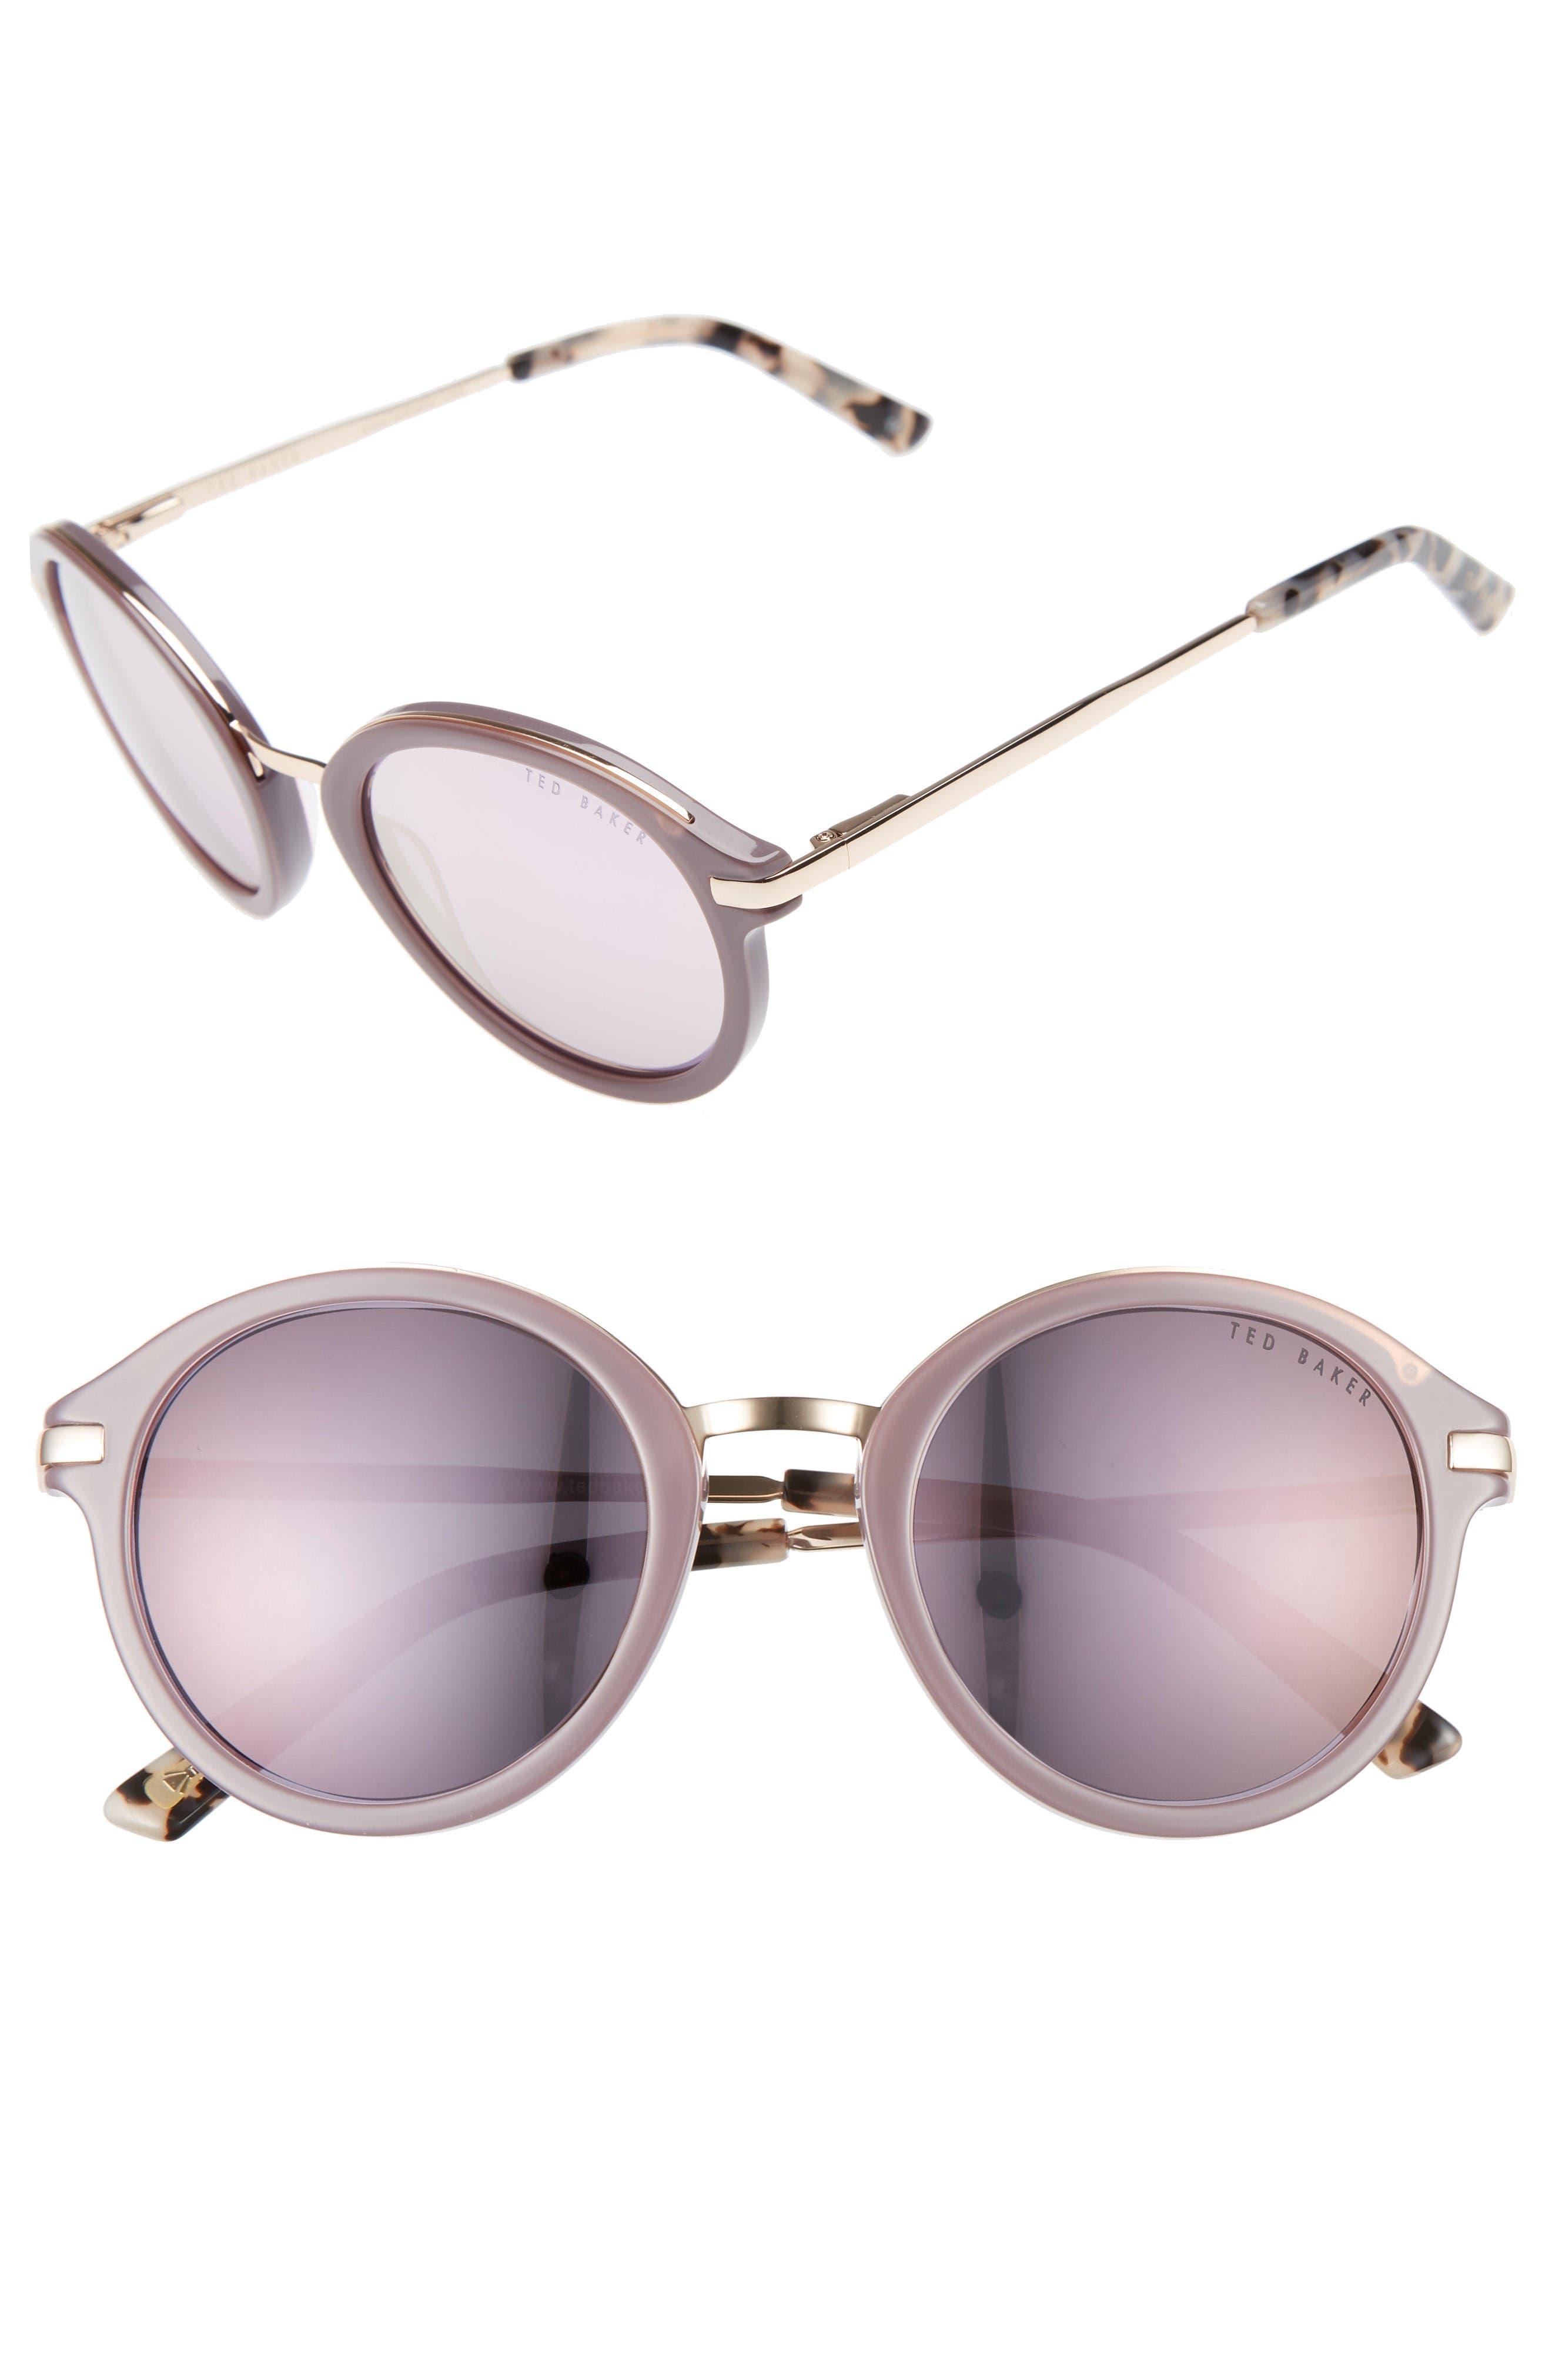 49mm Round Sunglasses,                             Main thumbnail 1, color,                             Grey